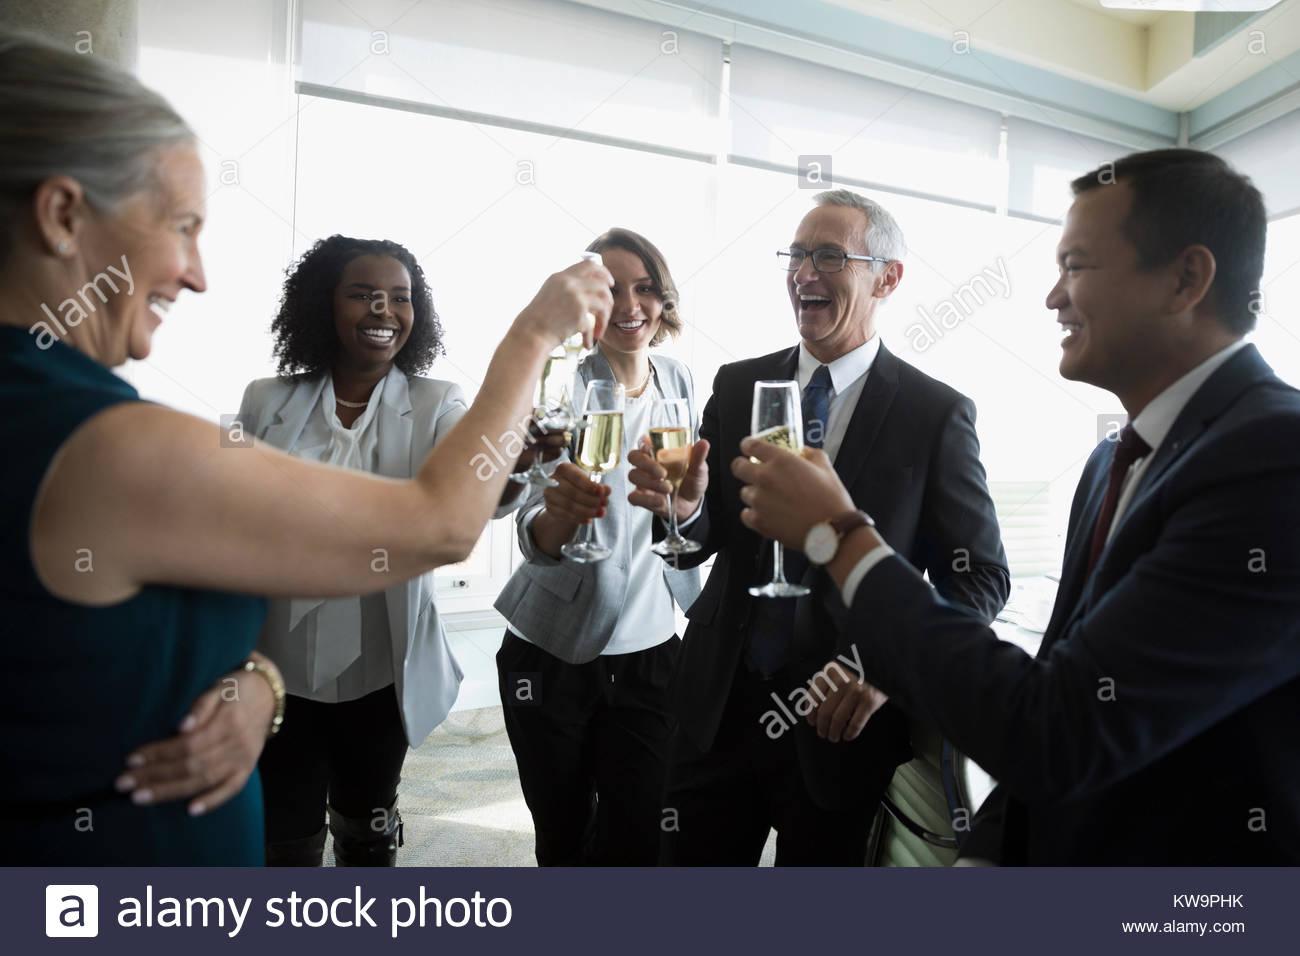 Happy business people celebrating toasting champagne verres,dans la salle de conférence Photo Stock